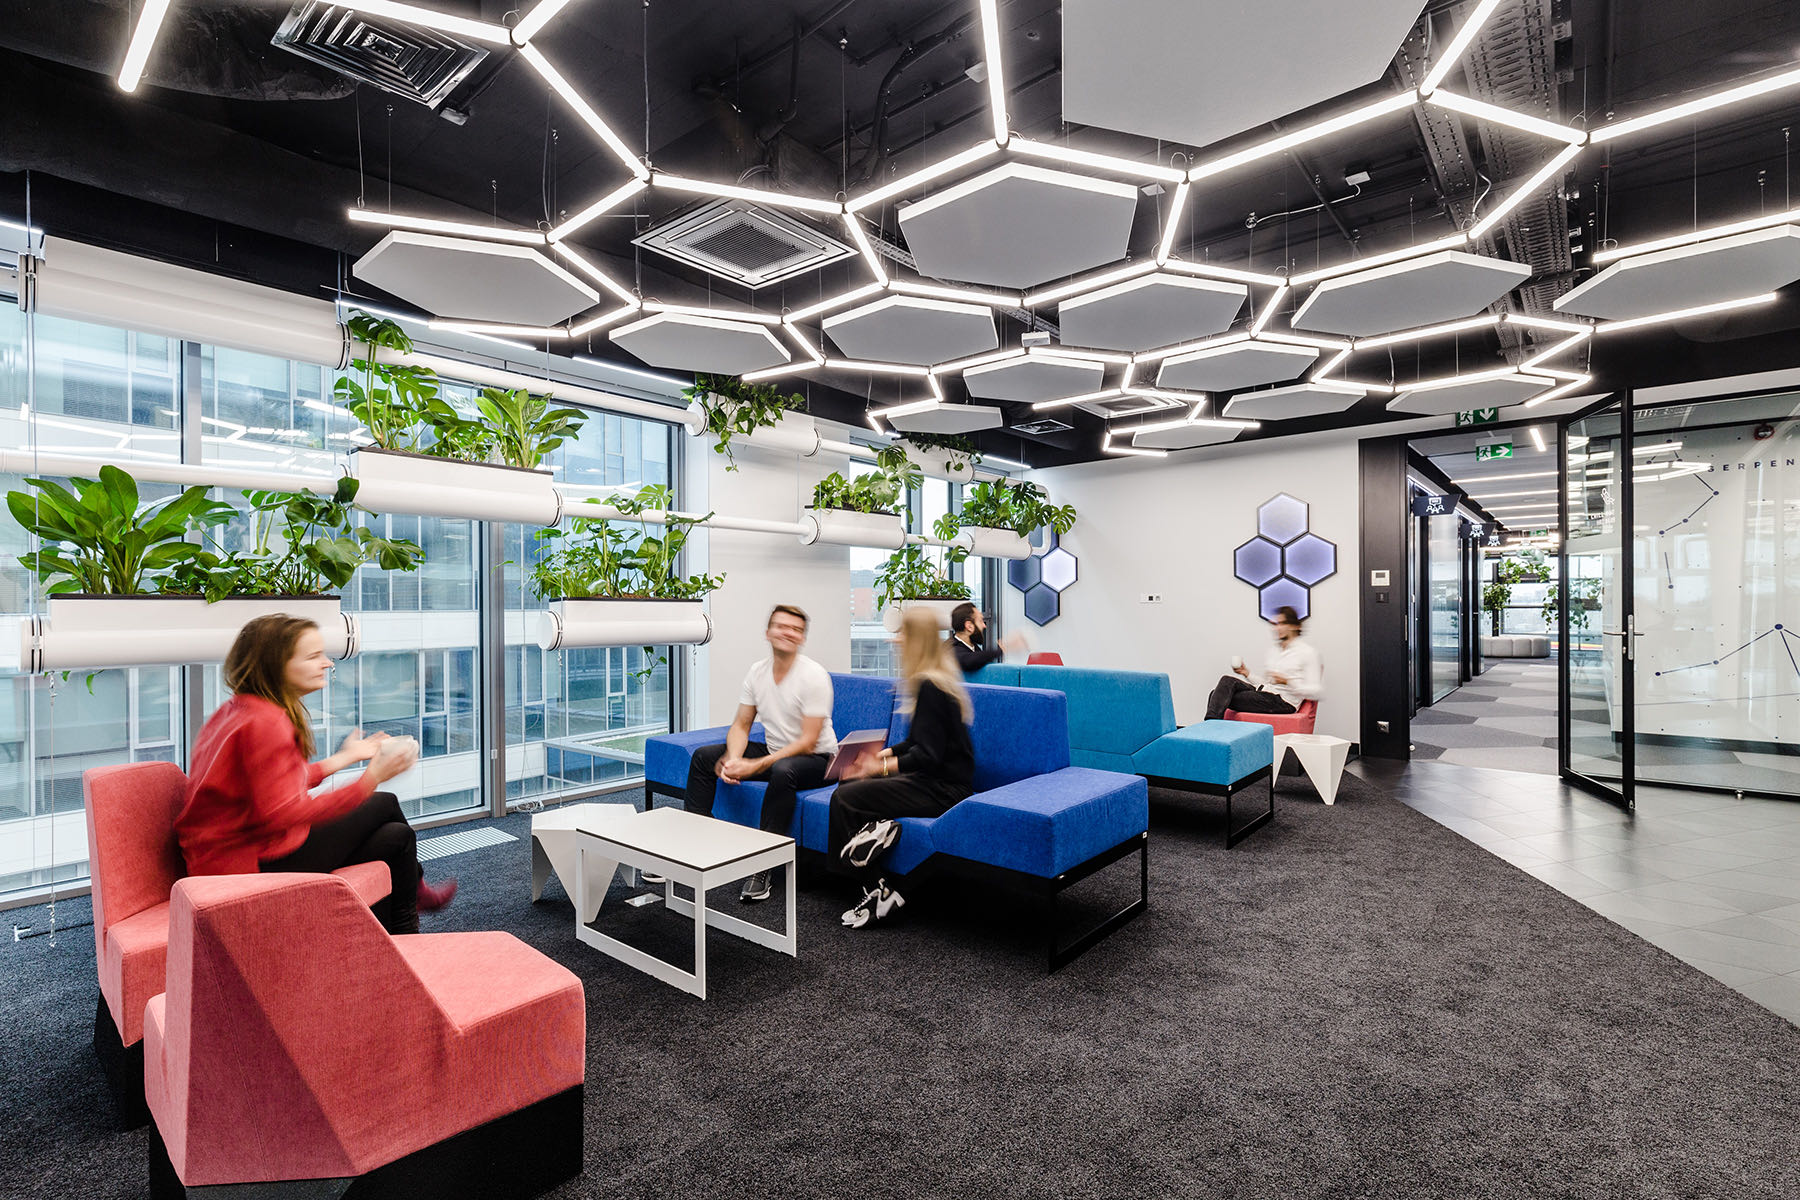 nordea-warsaw-office-26